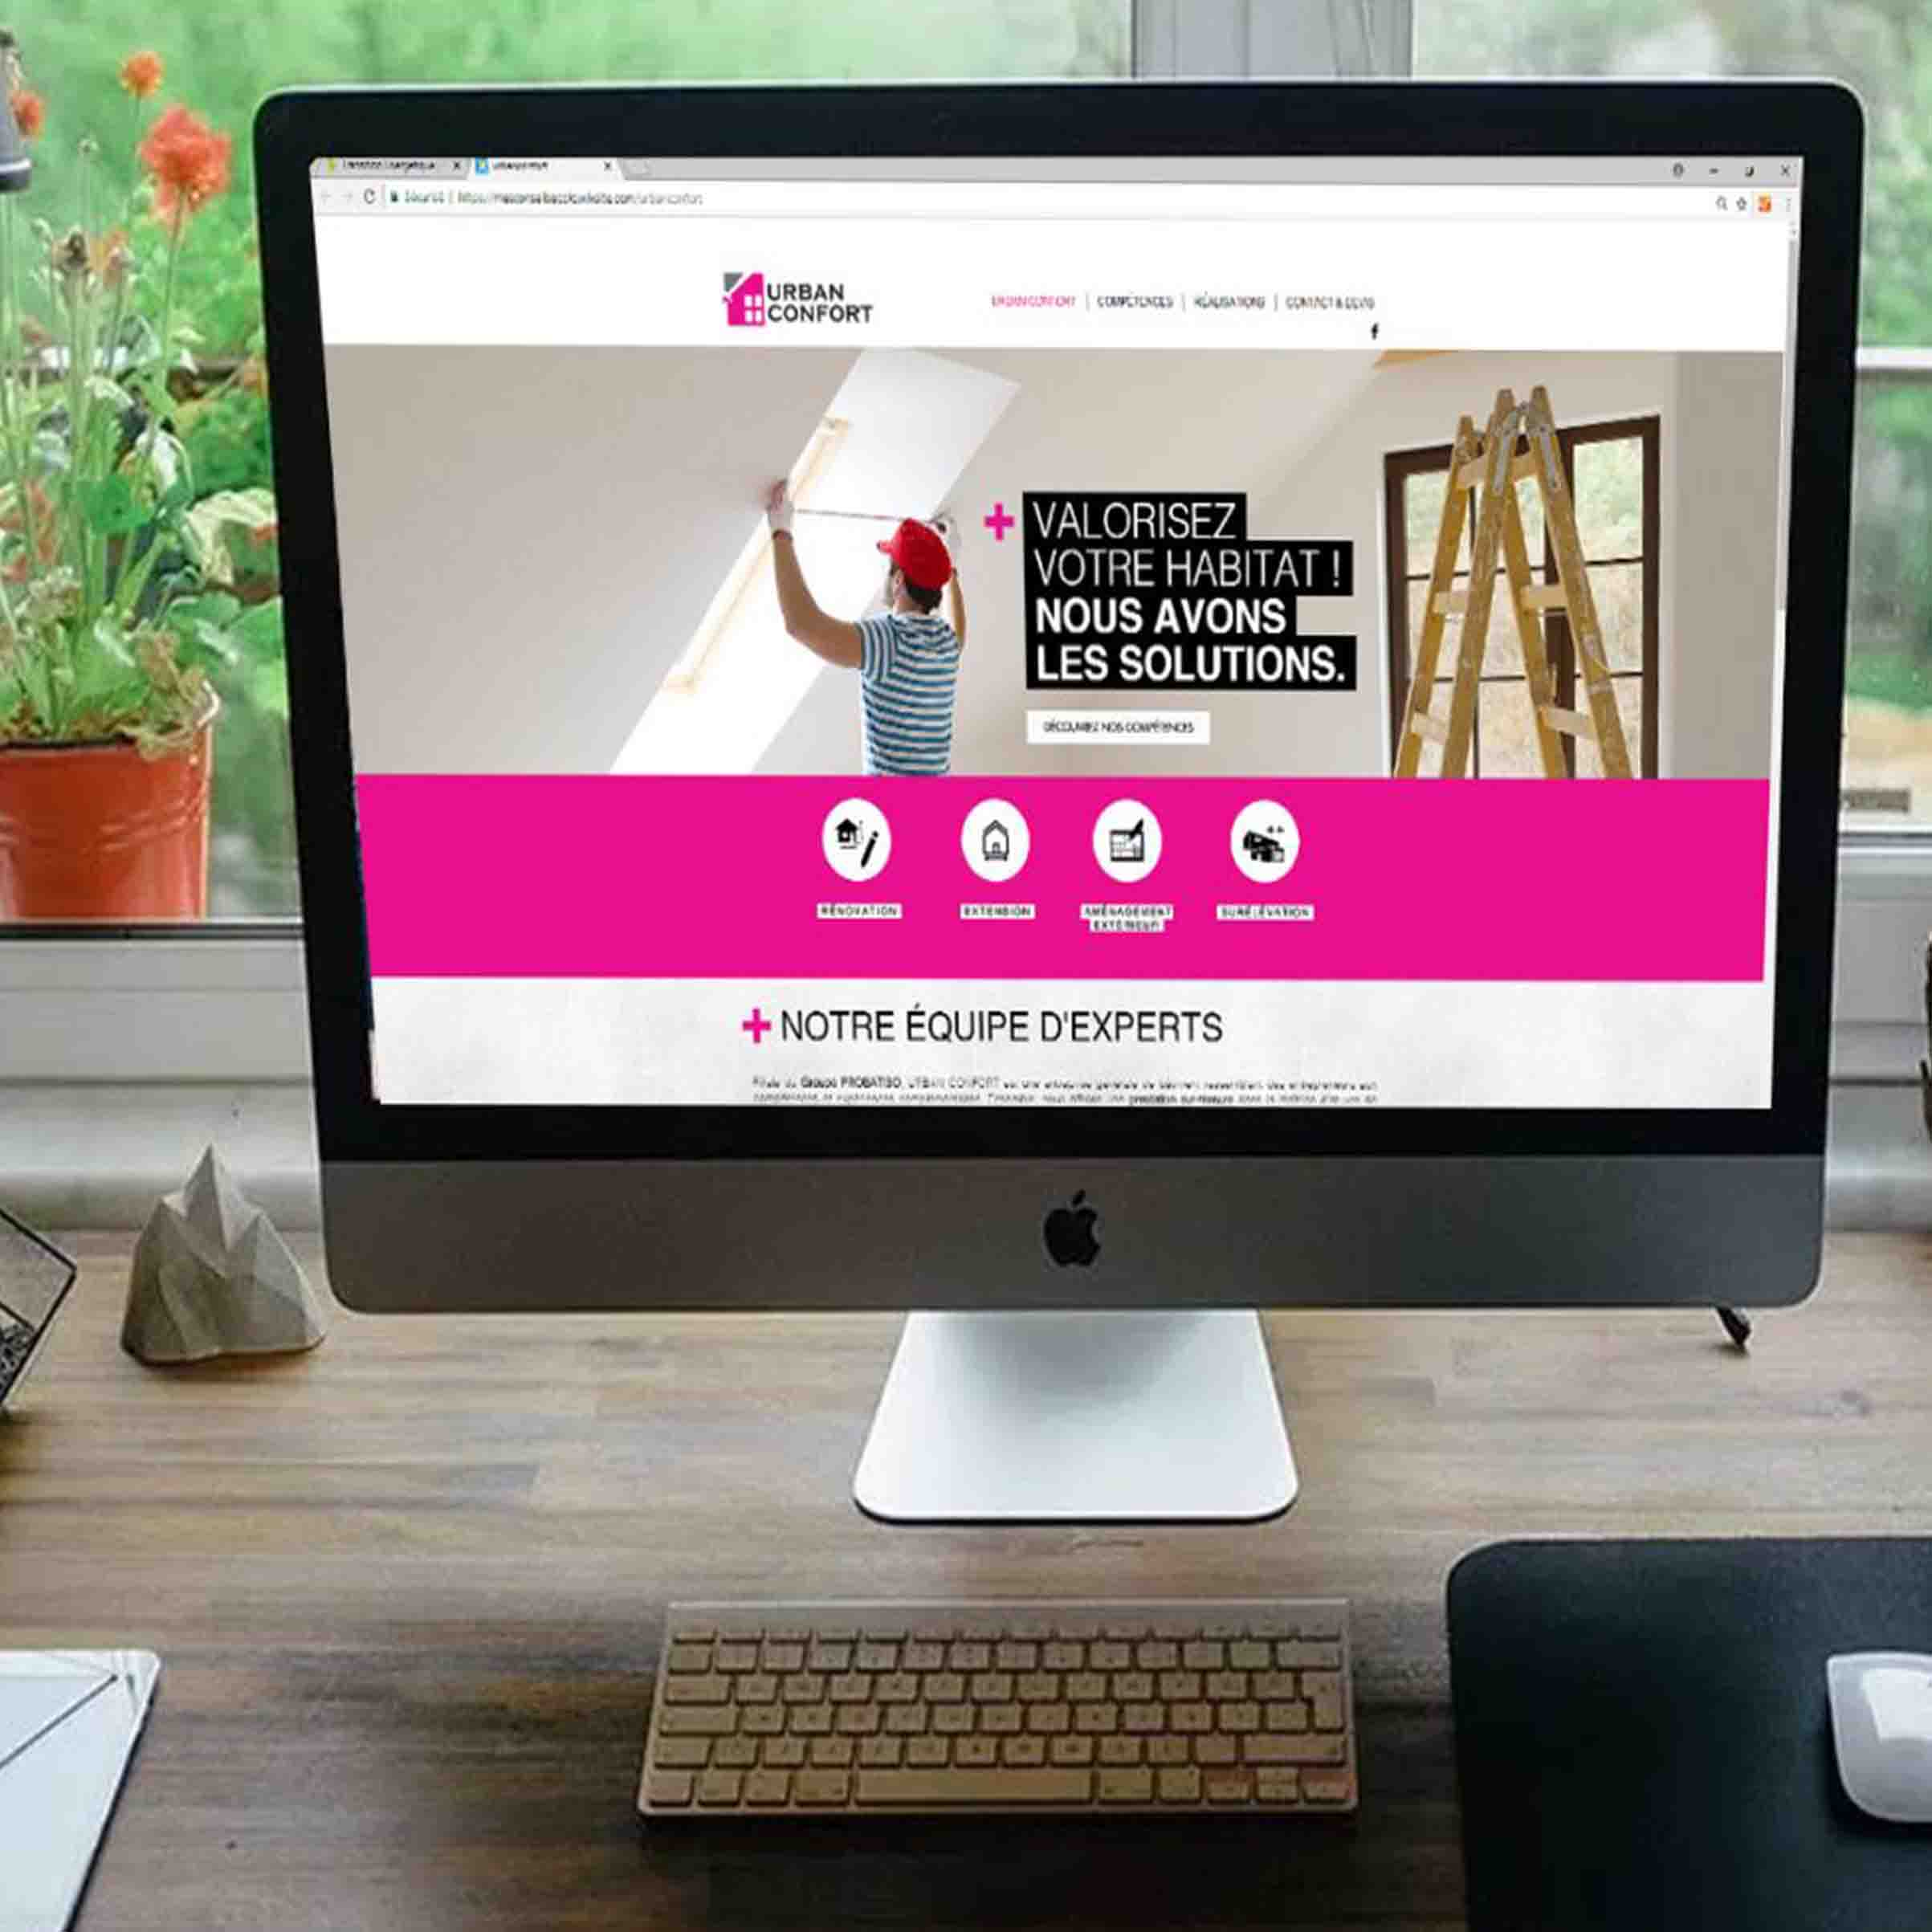 Projet de site internet URBAN CONFORT - Delphine PENGUILLY - agence marketing digital Nantes